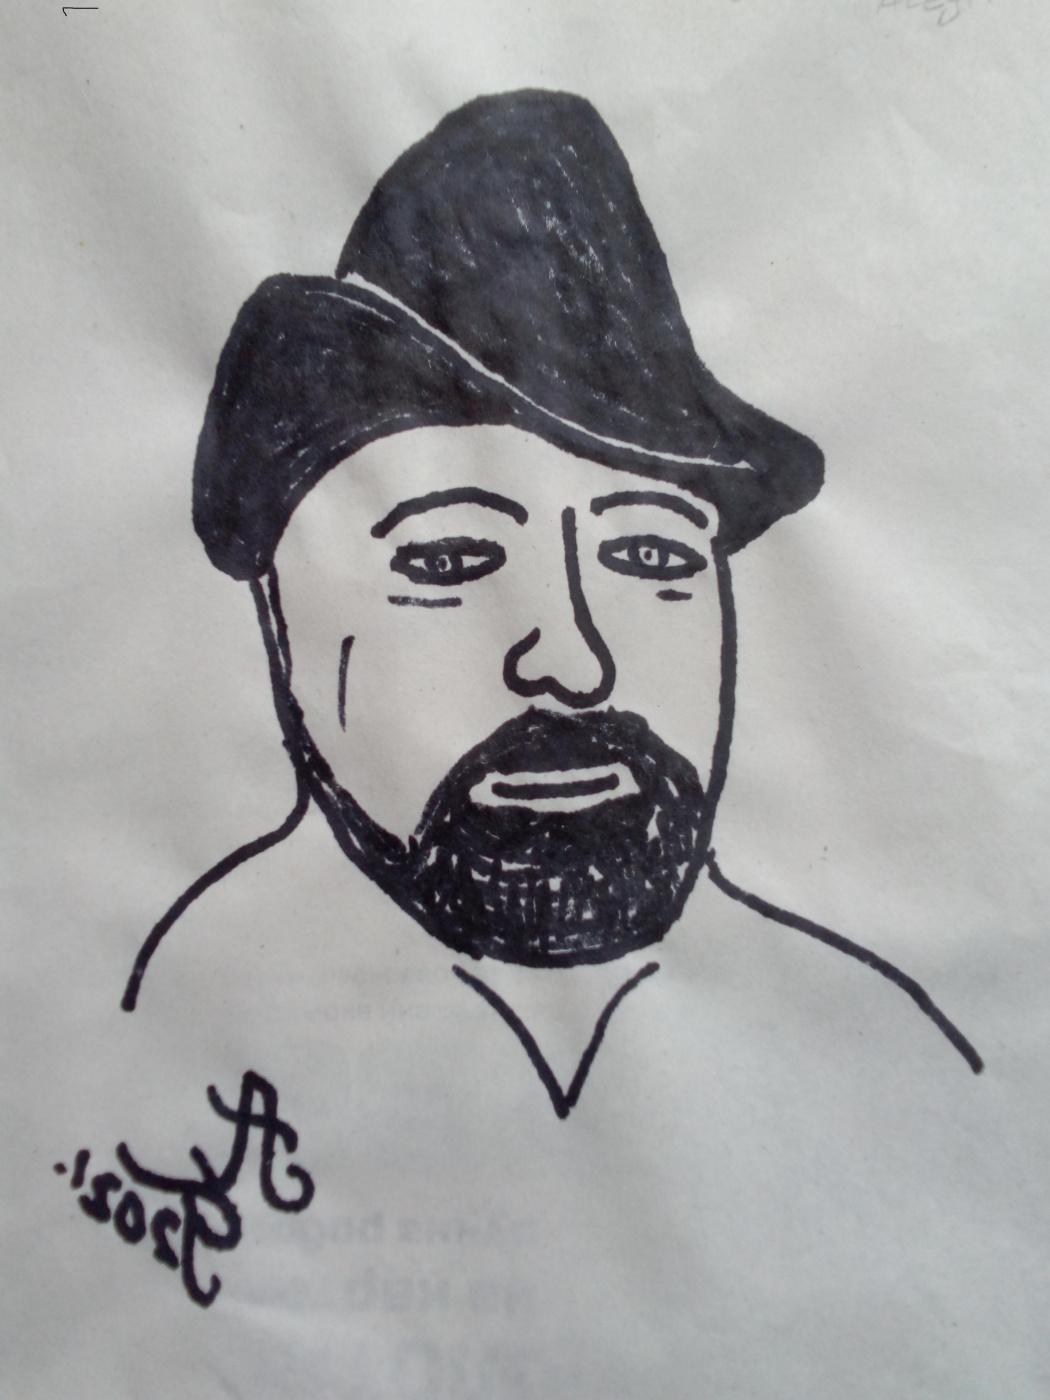 Alexey Grishankov (Alegri). In a black hat